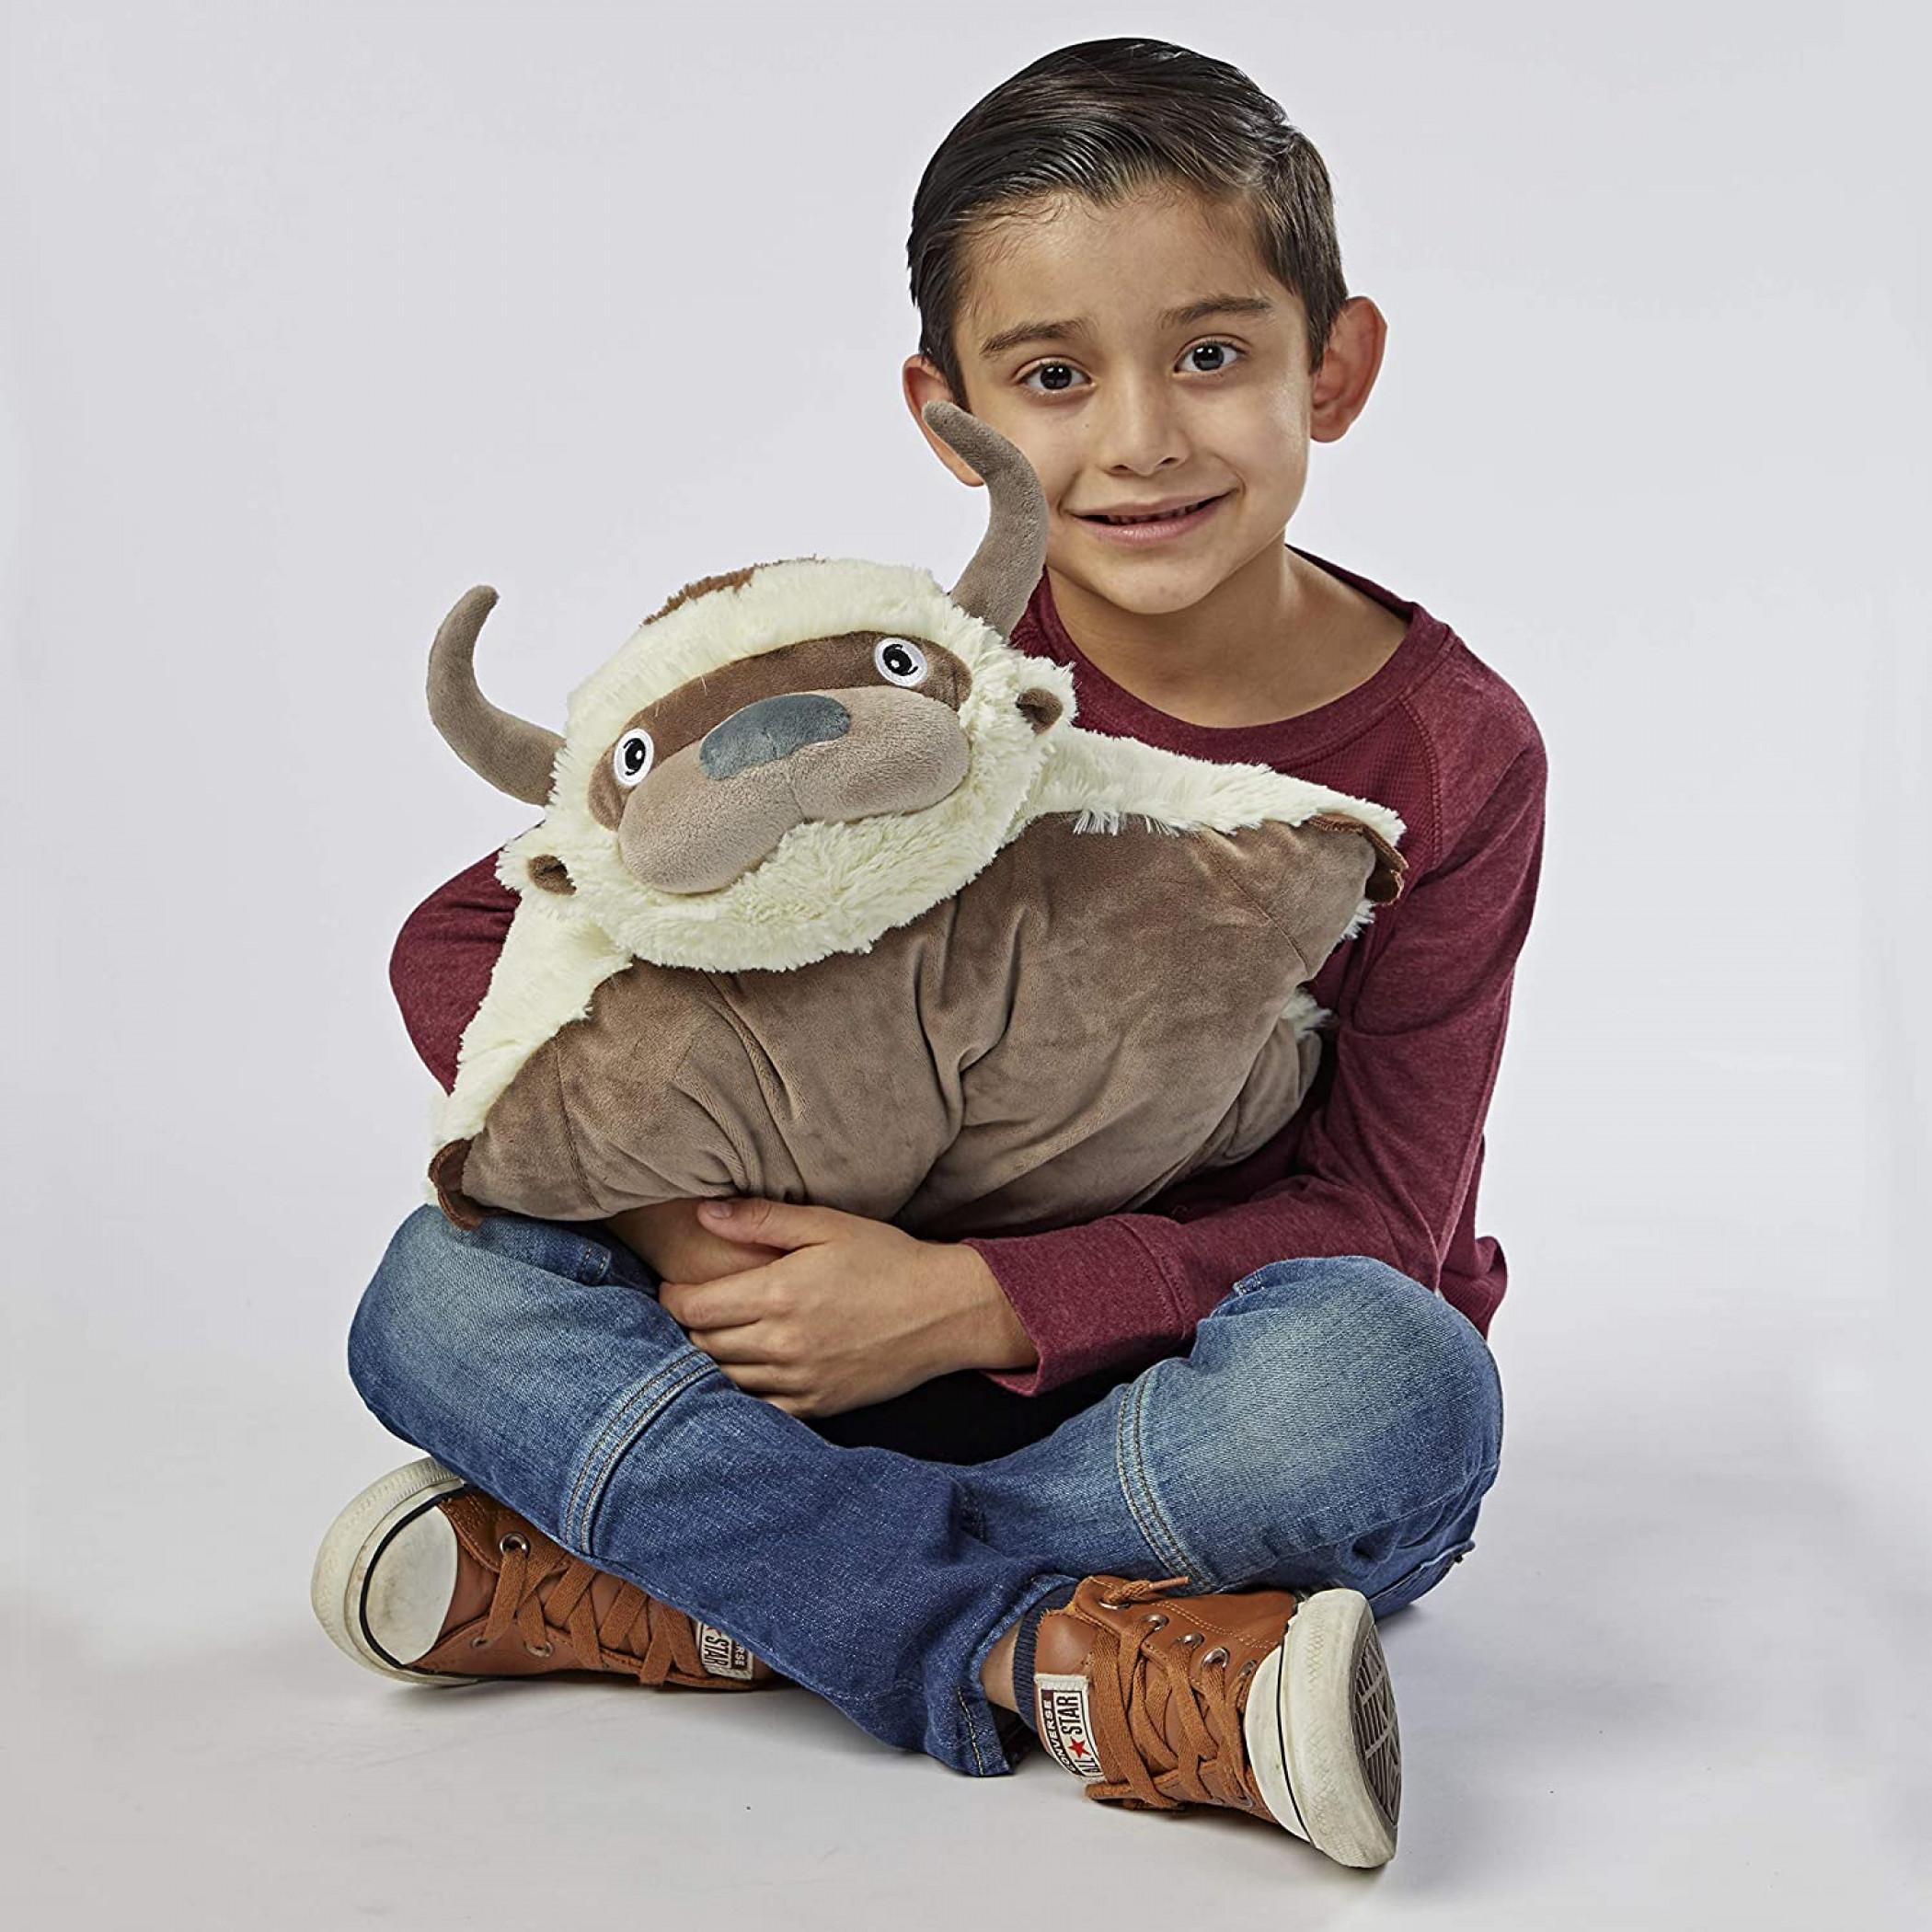 Appa Pillow Pet - Avatar: The Last Airbender Stuffed Animal Plush Toy